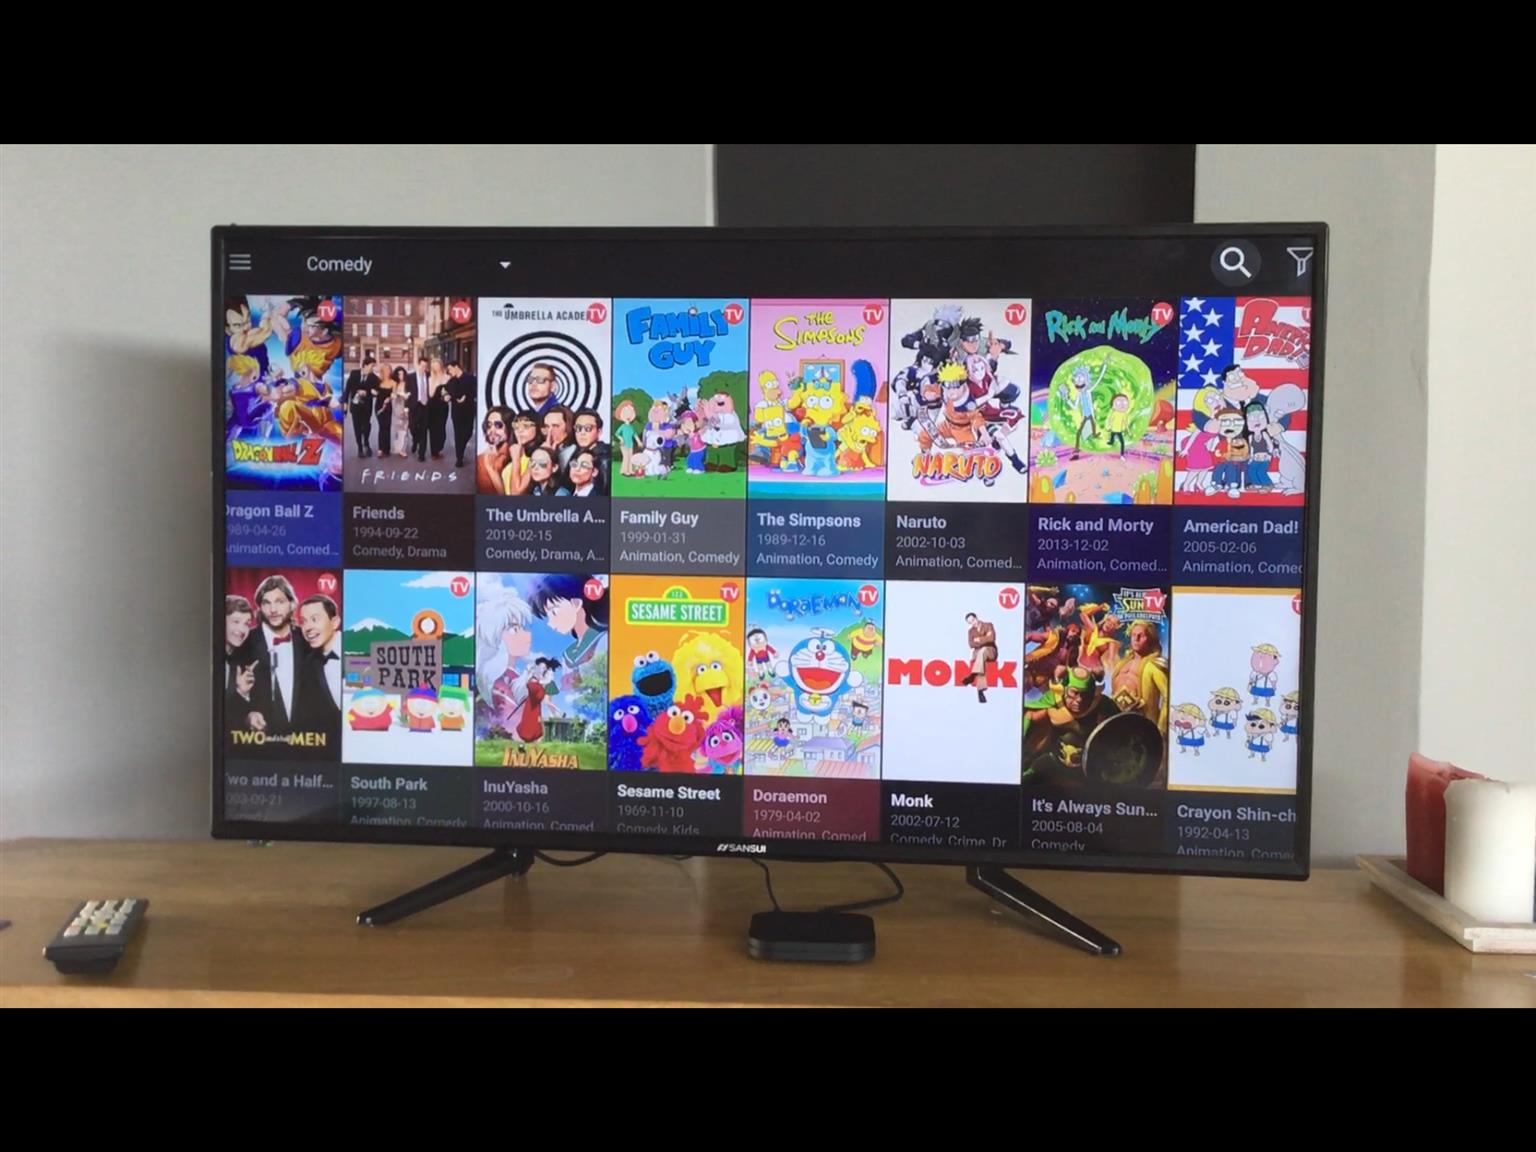 Xiaomi Mi Box S - live Tv, sky sports, series, movies. No subscriptions needed.